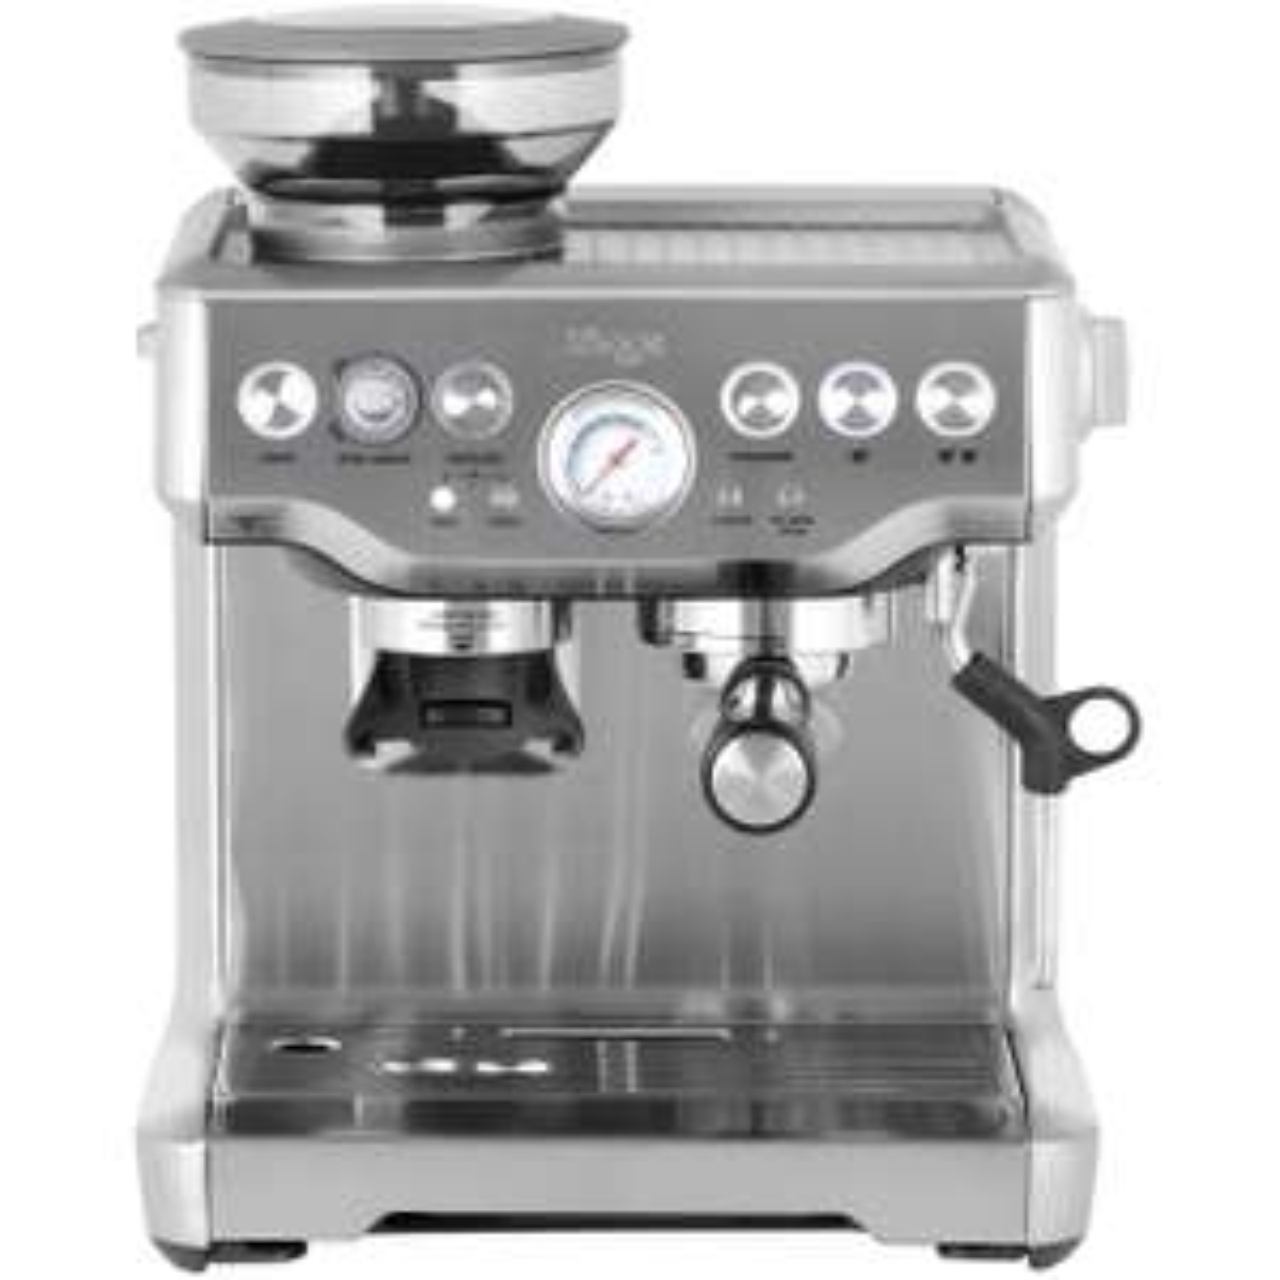 Sage Barista Express BES875UK Espresso Coffee Machine with Integrated Burr Grinder - £449 @ AO.com